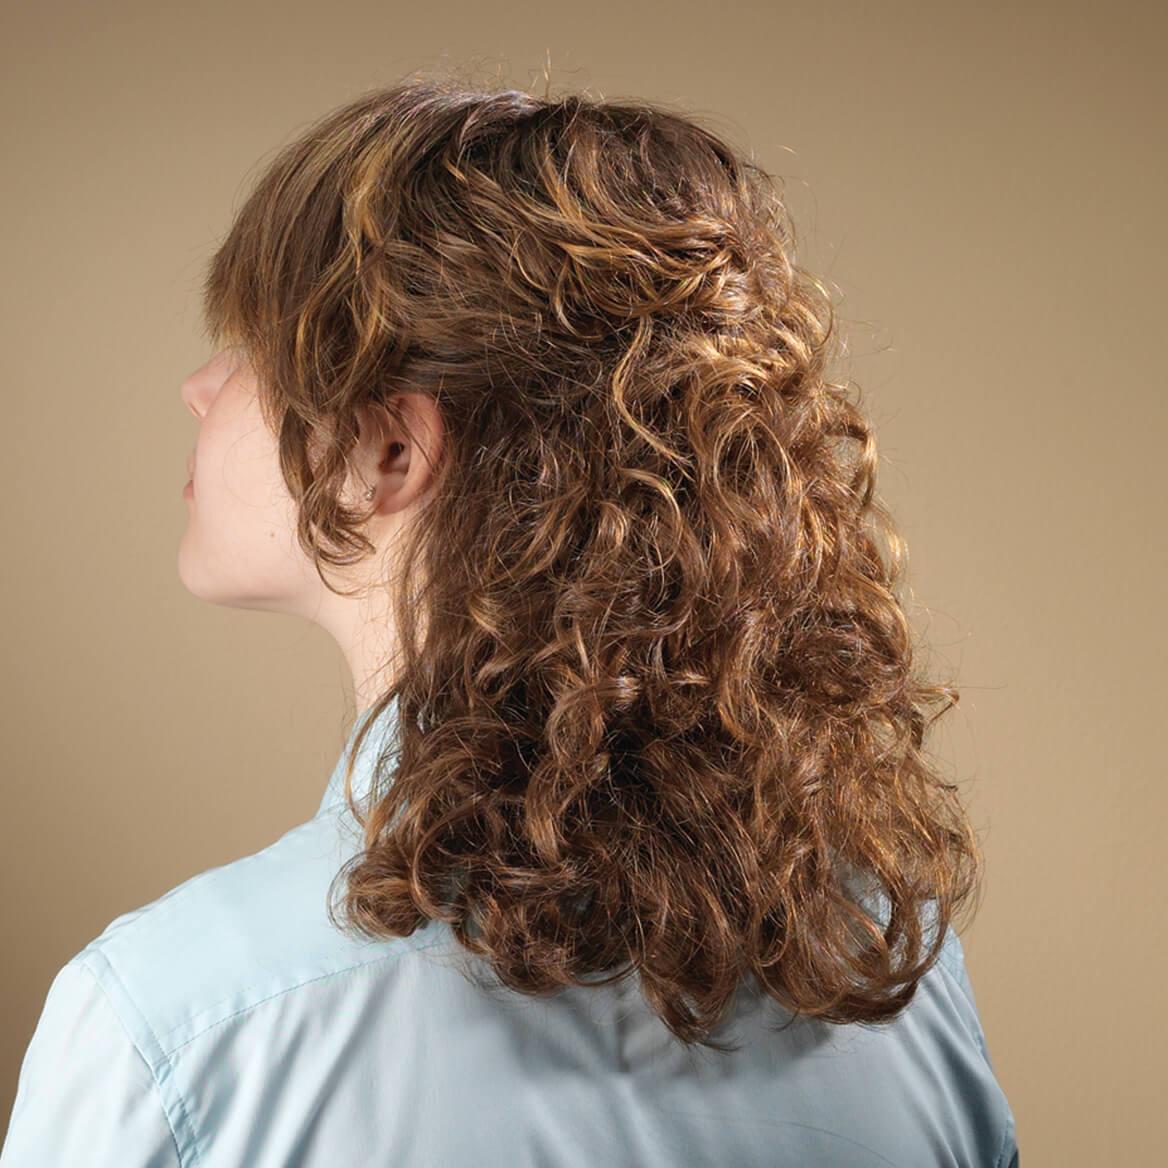 Hair Spools Set of 24-331356